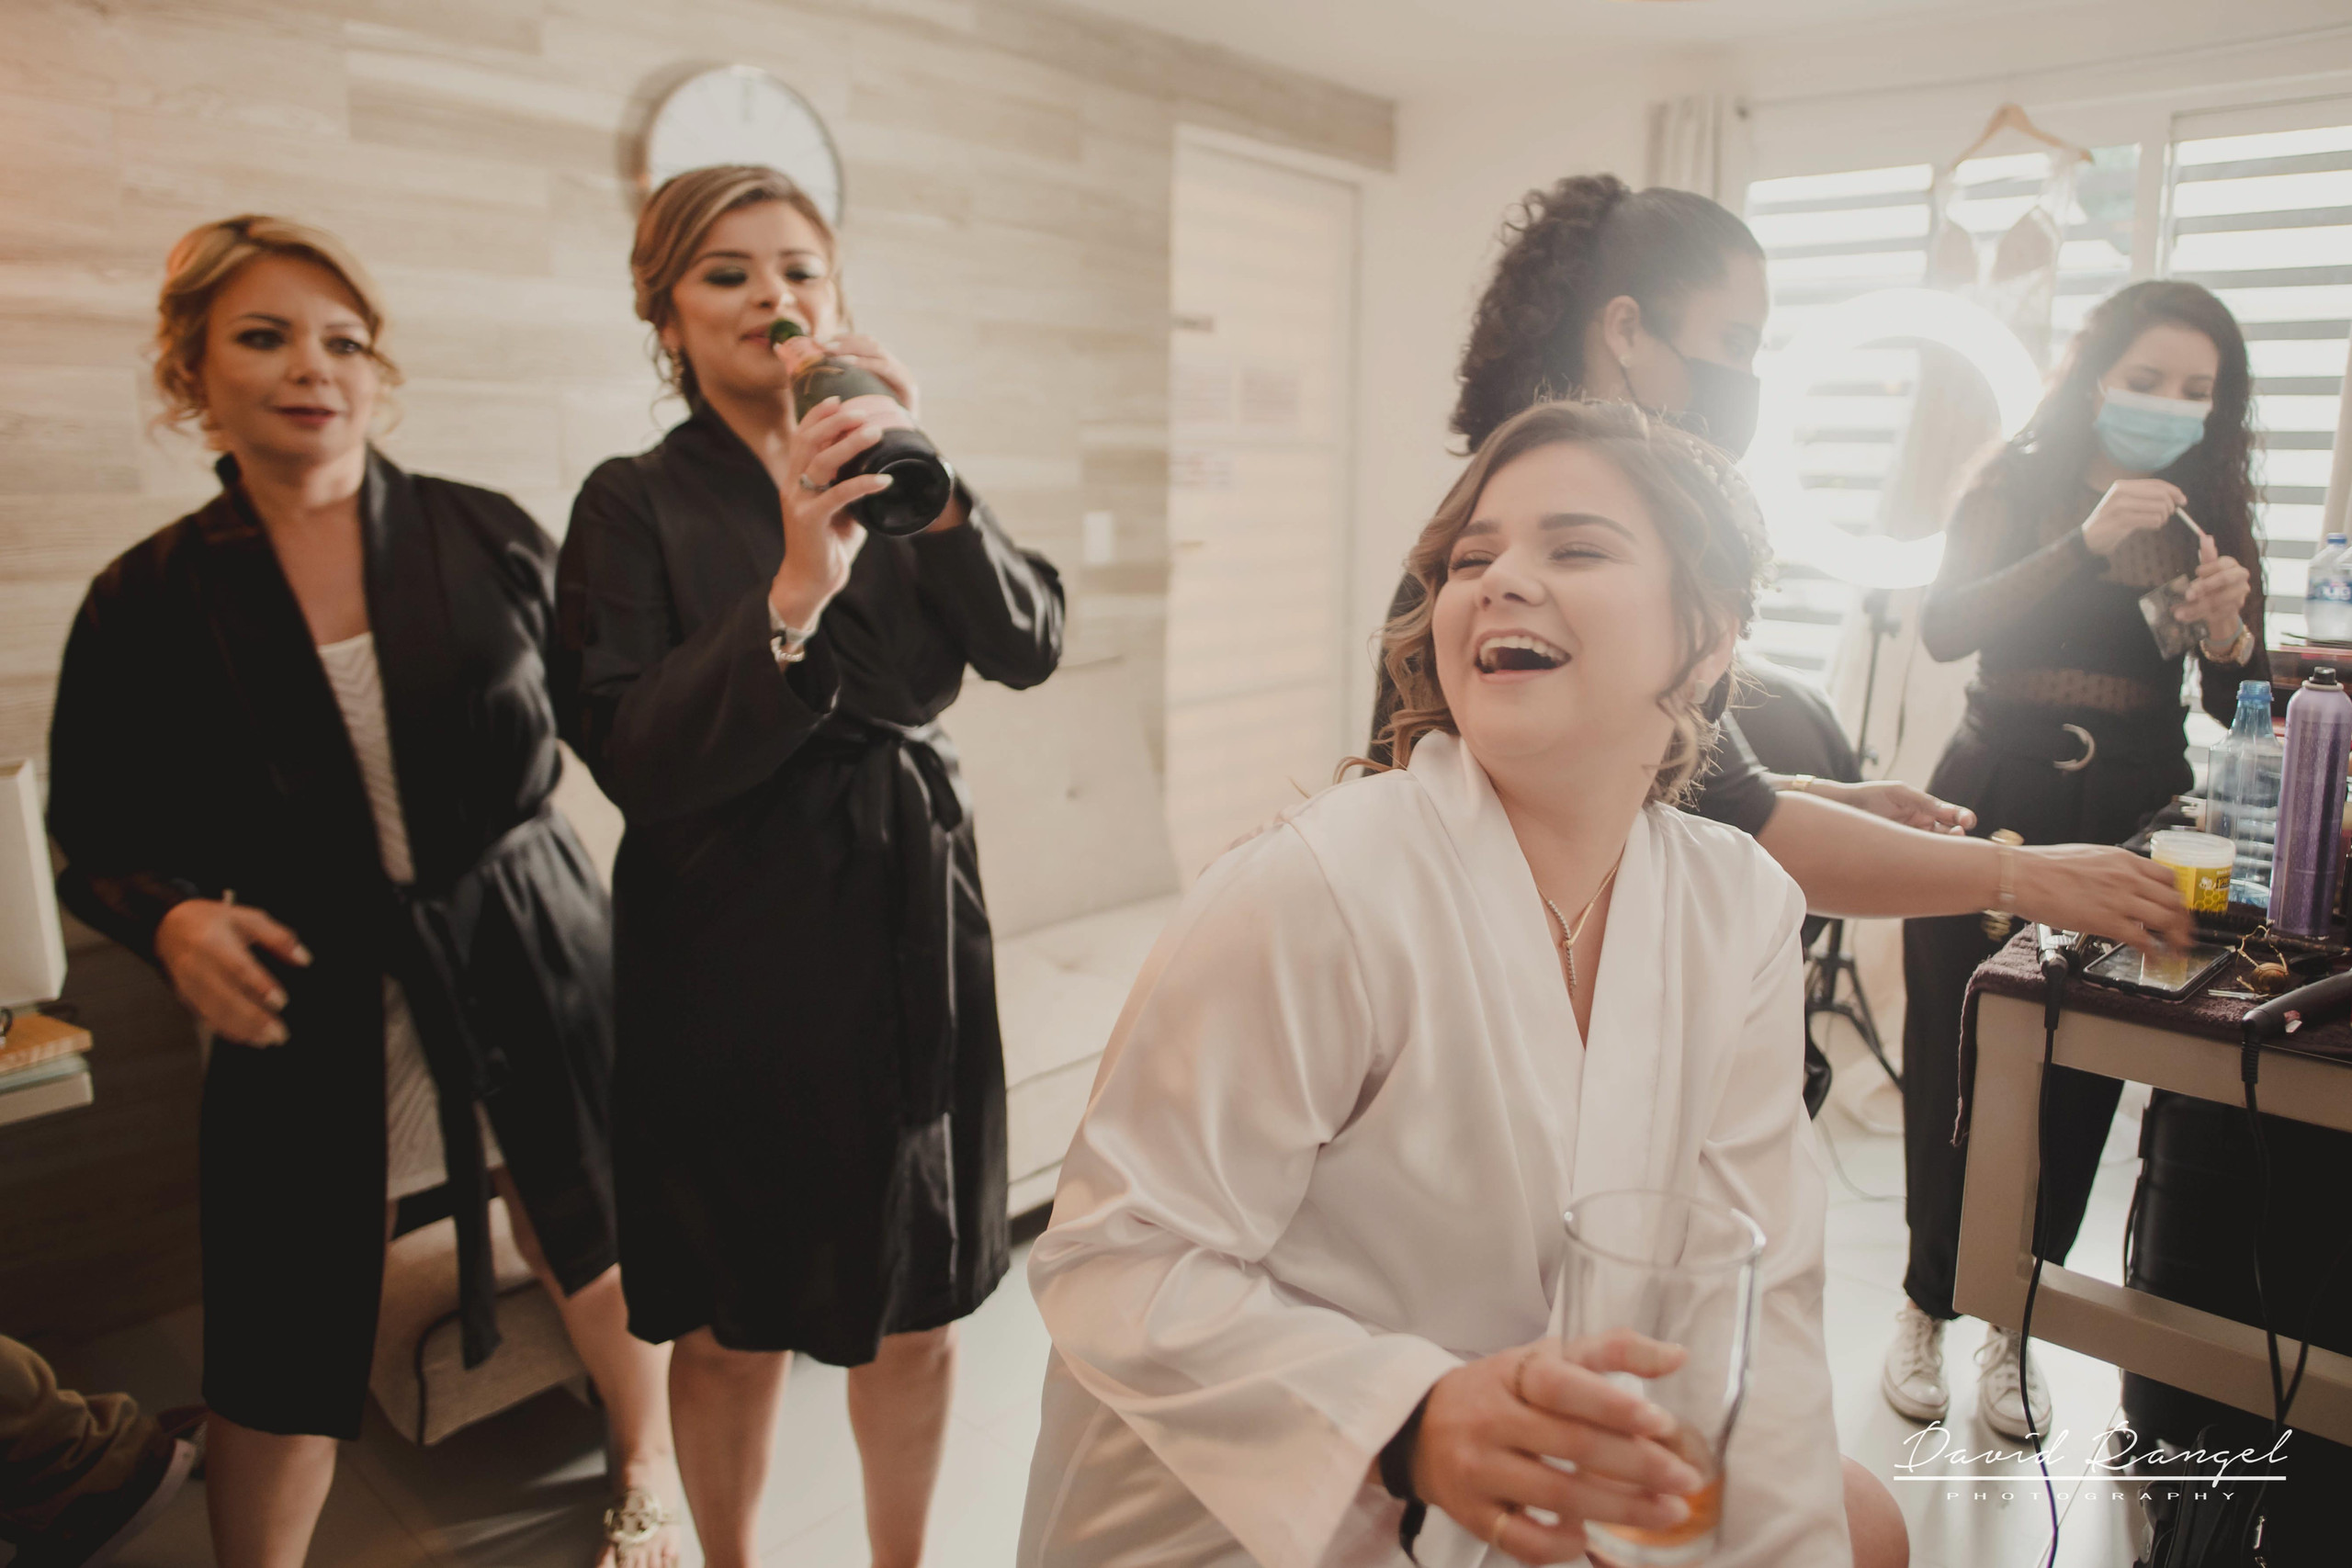 bride+getting+ready+shadow+earring++bathrobe+natural+ligh+photo+destination+wedding+isla+blanca+smile+mirror+photo+celebration+bridesmaids+mother+sister+bestfriend